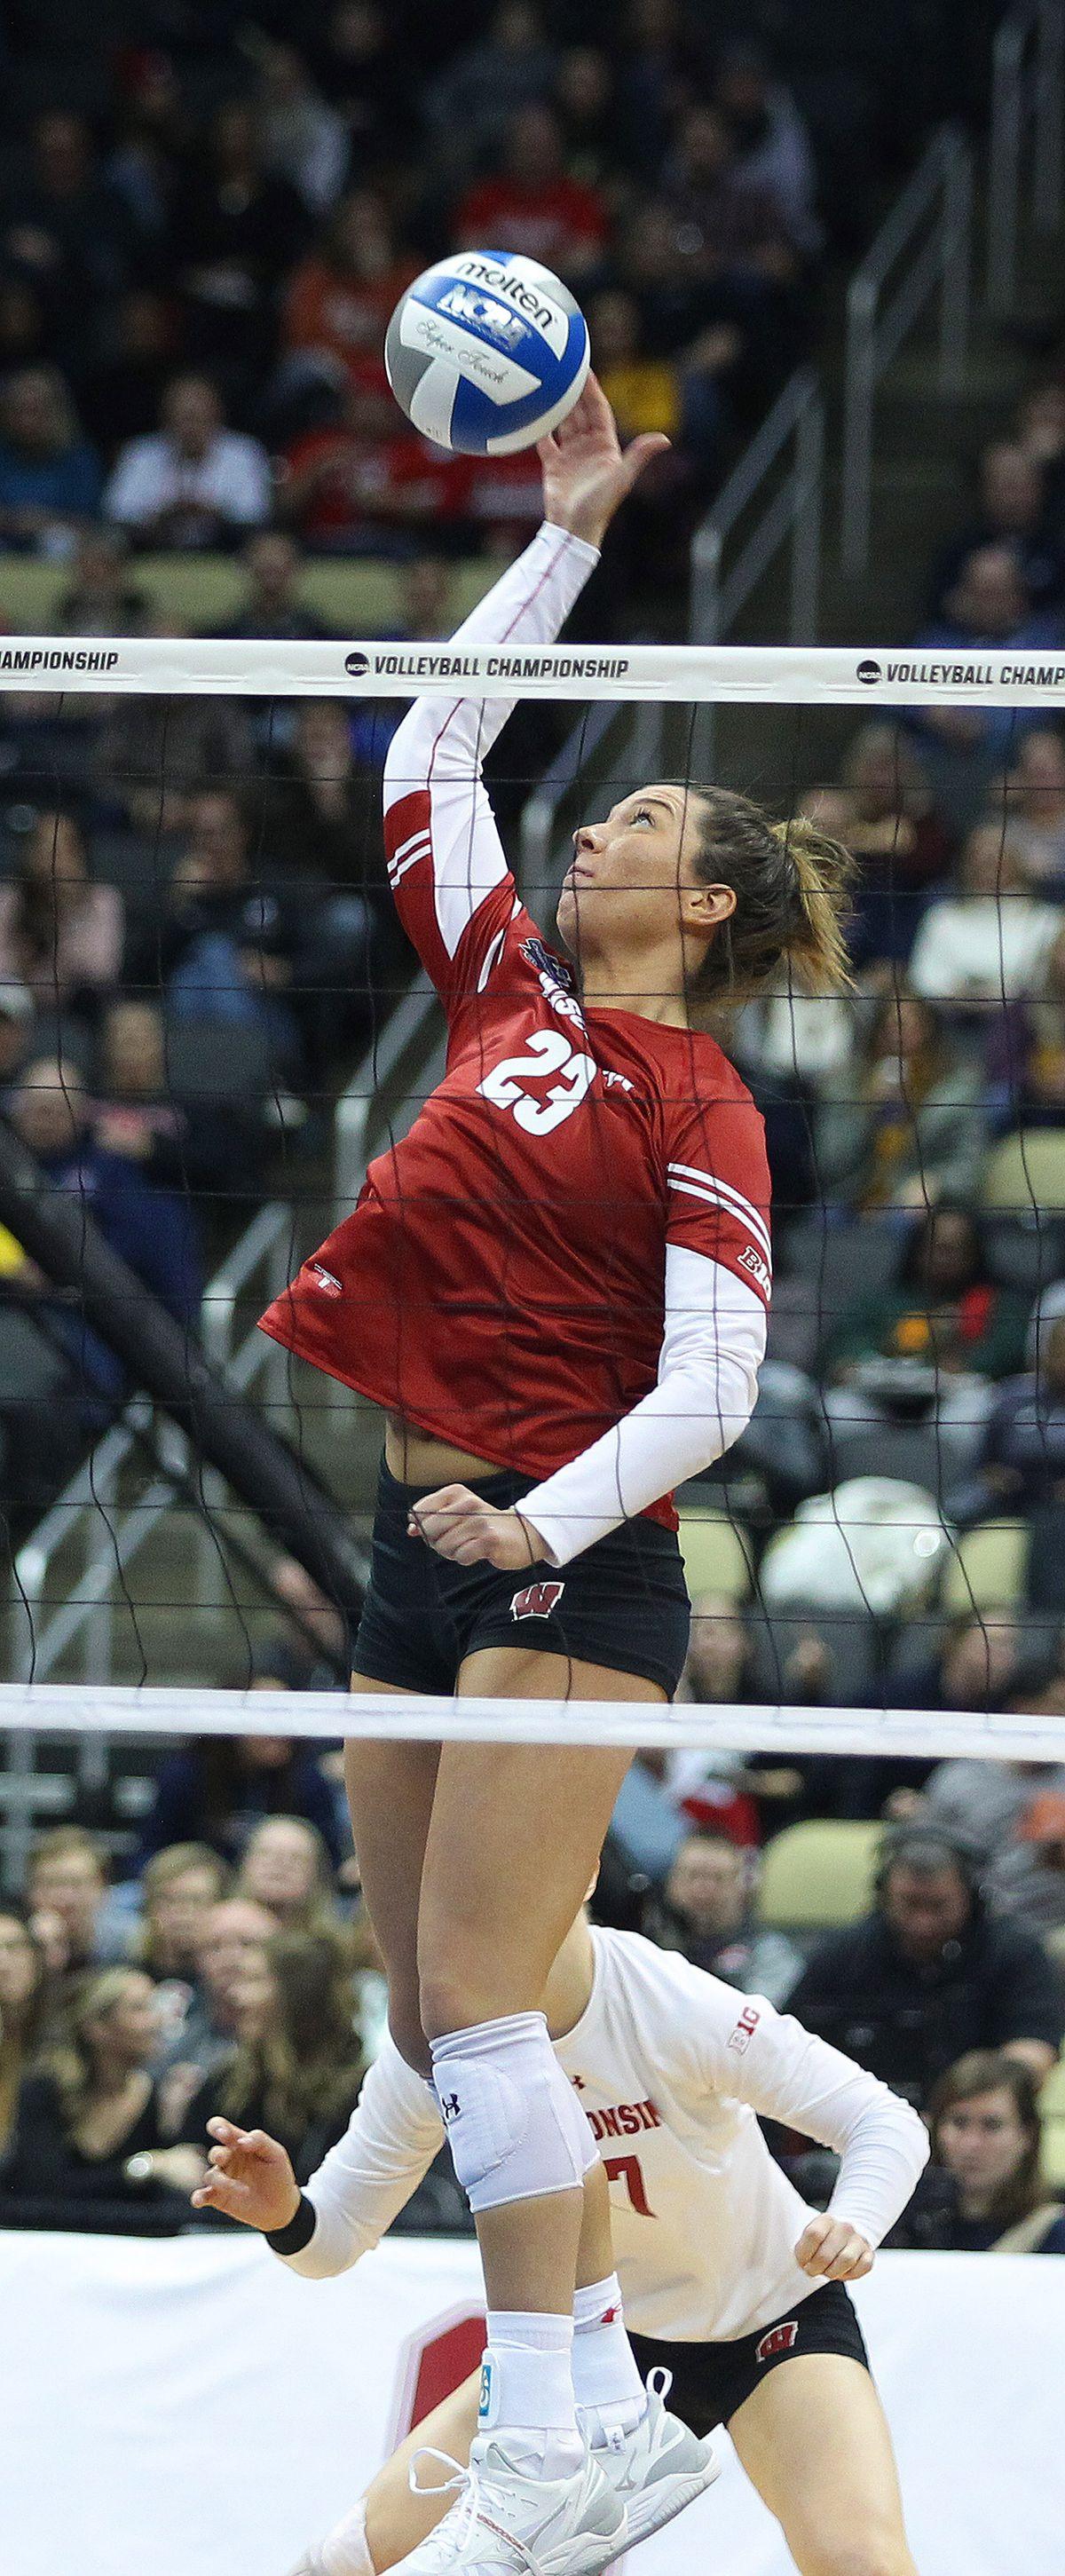 NCAA VOLLEYBALL: DEC 19 Div I Women's Championship - Wisconsin v Baylor